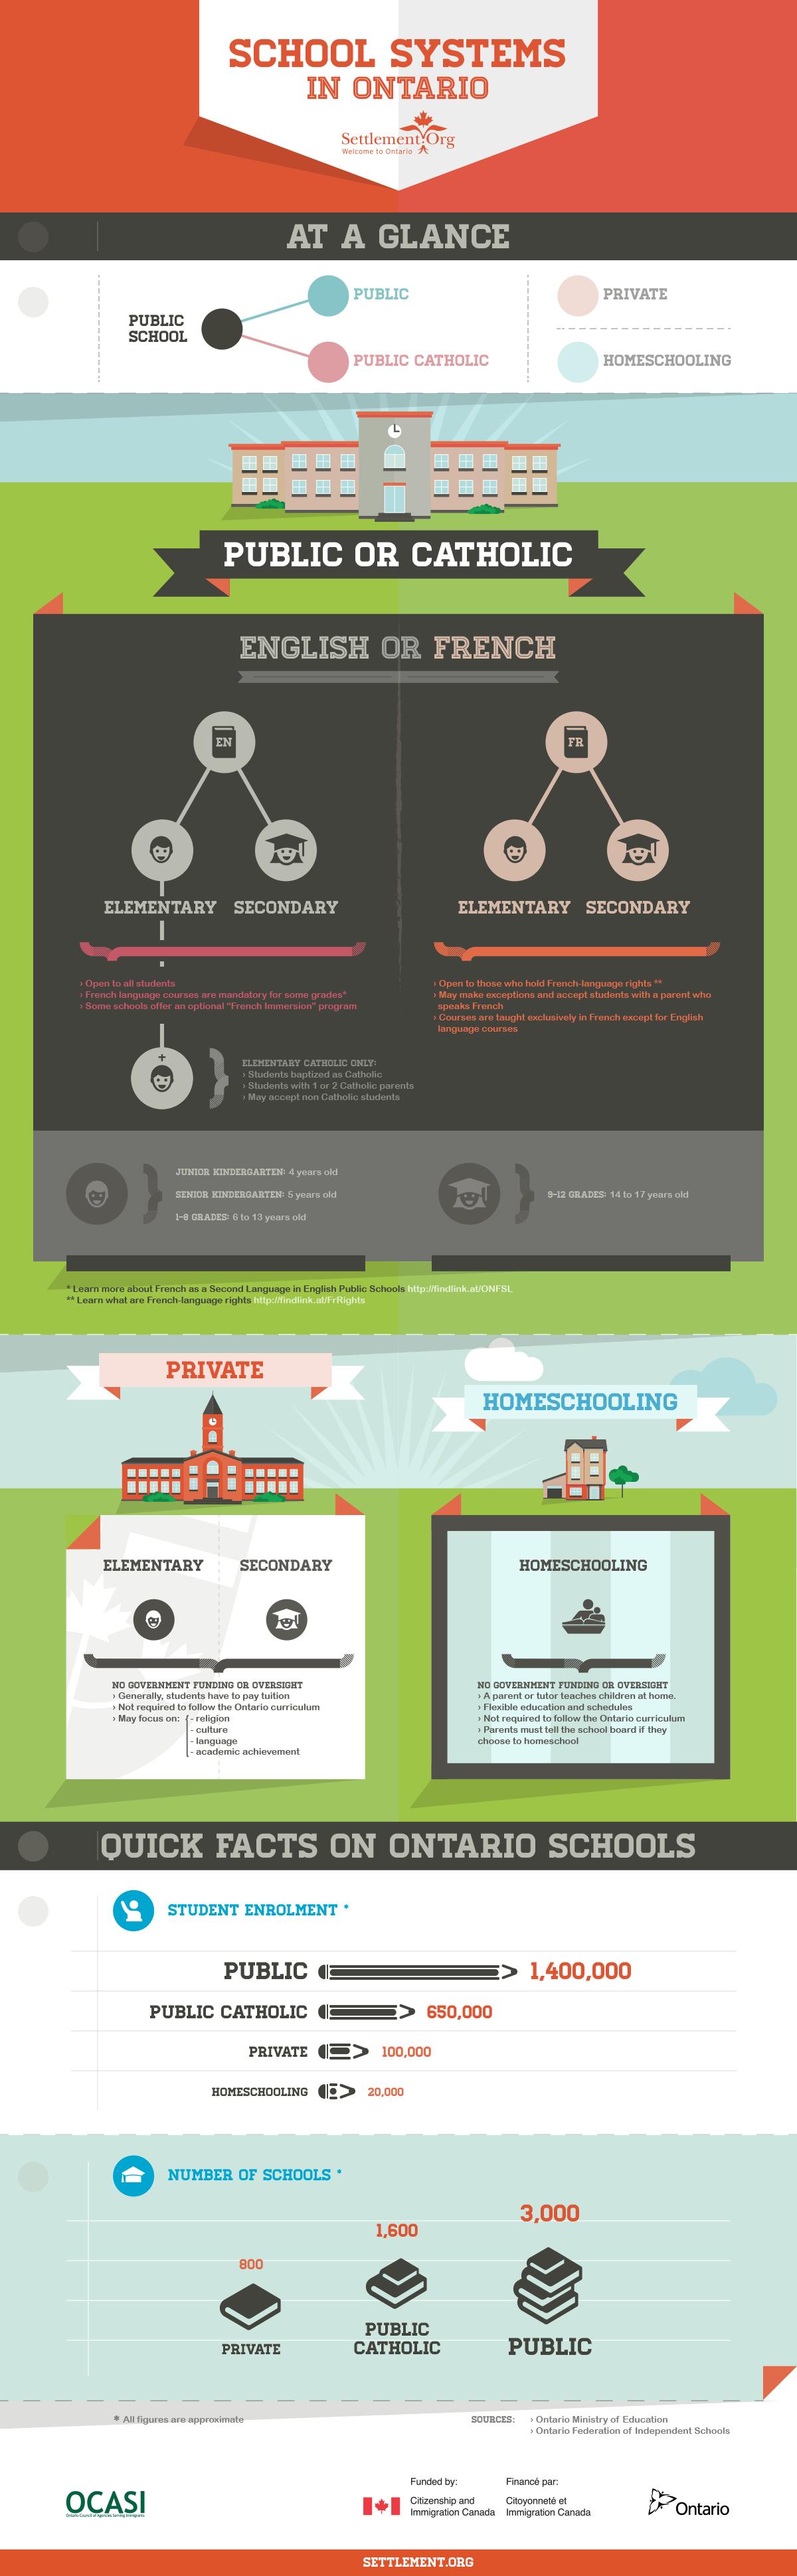 Infographic on Ontario's School System